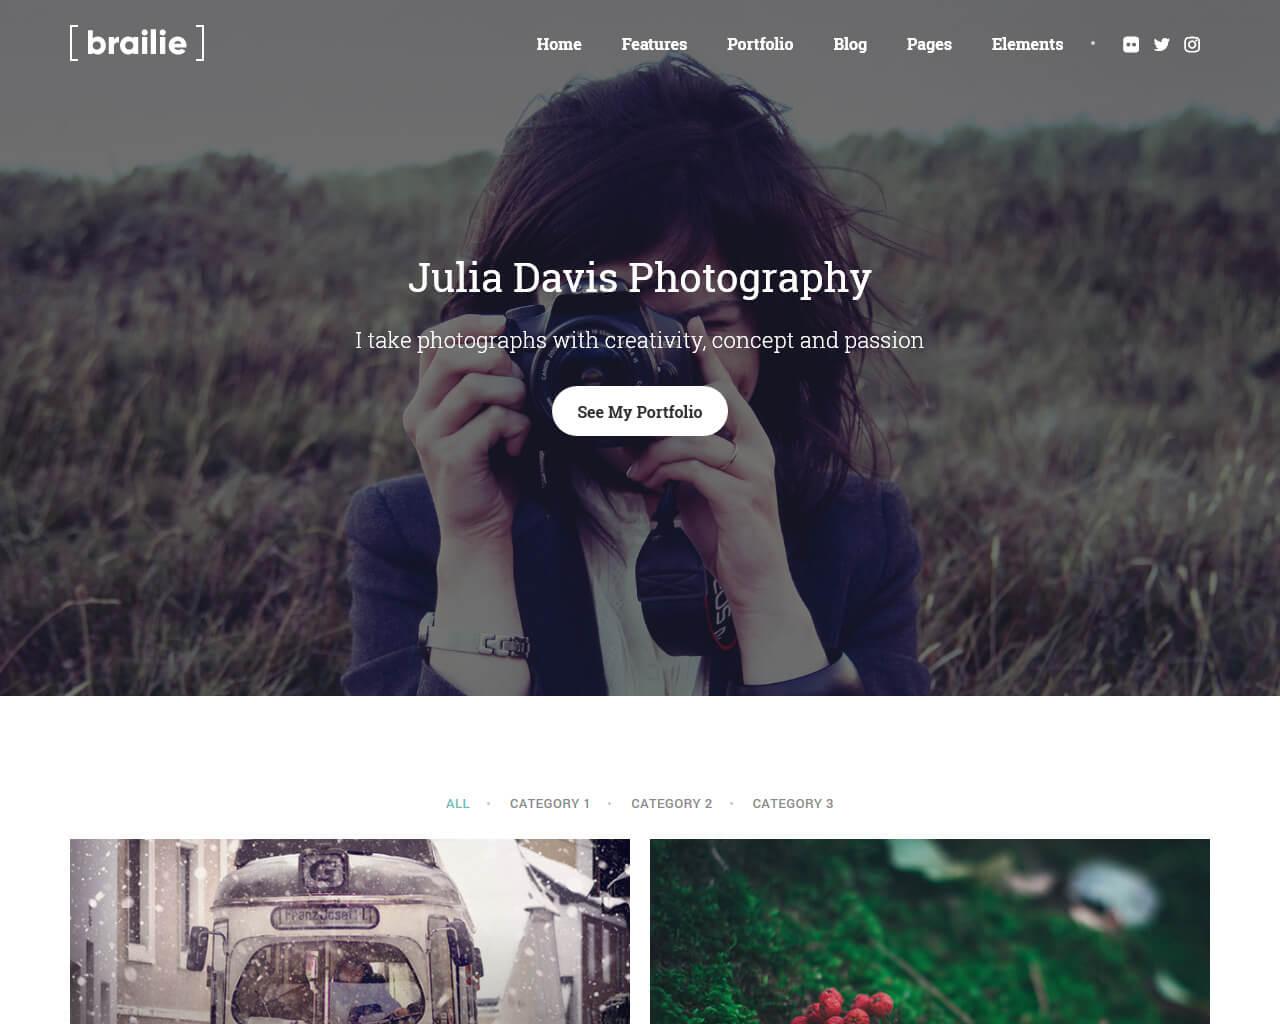 Brailie Website Template